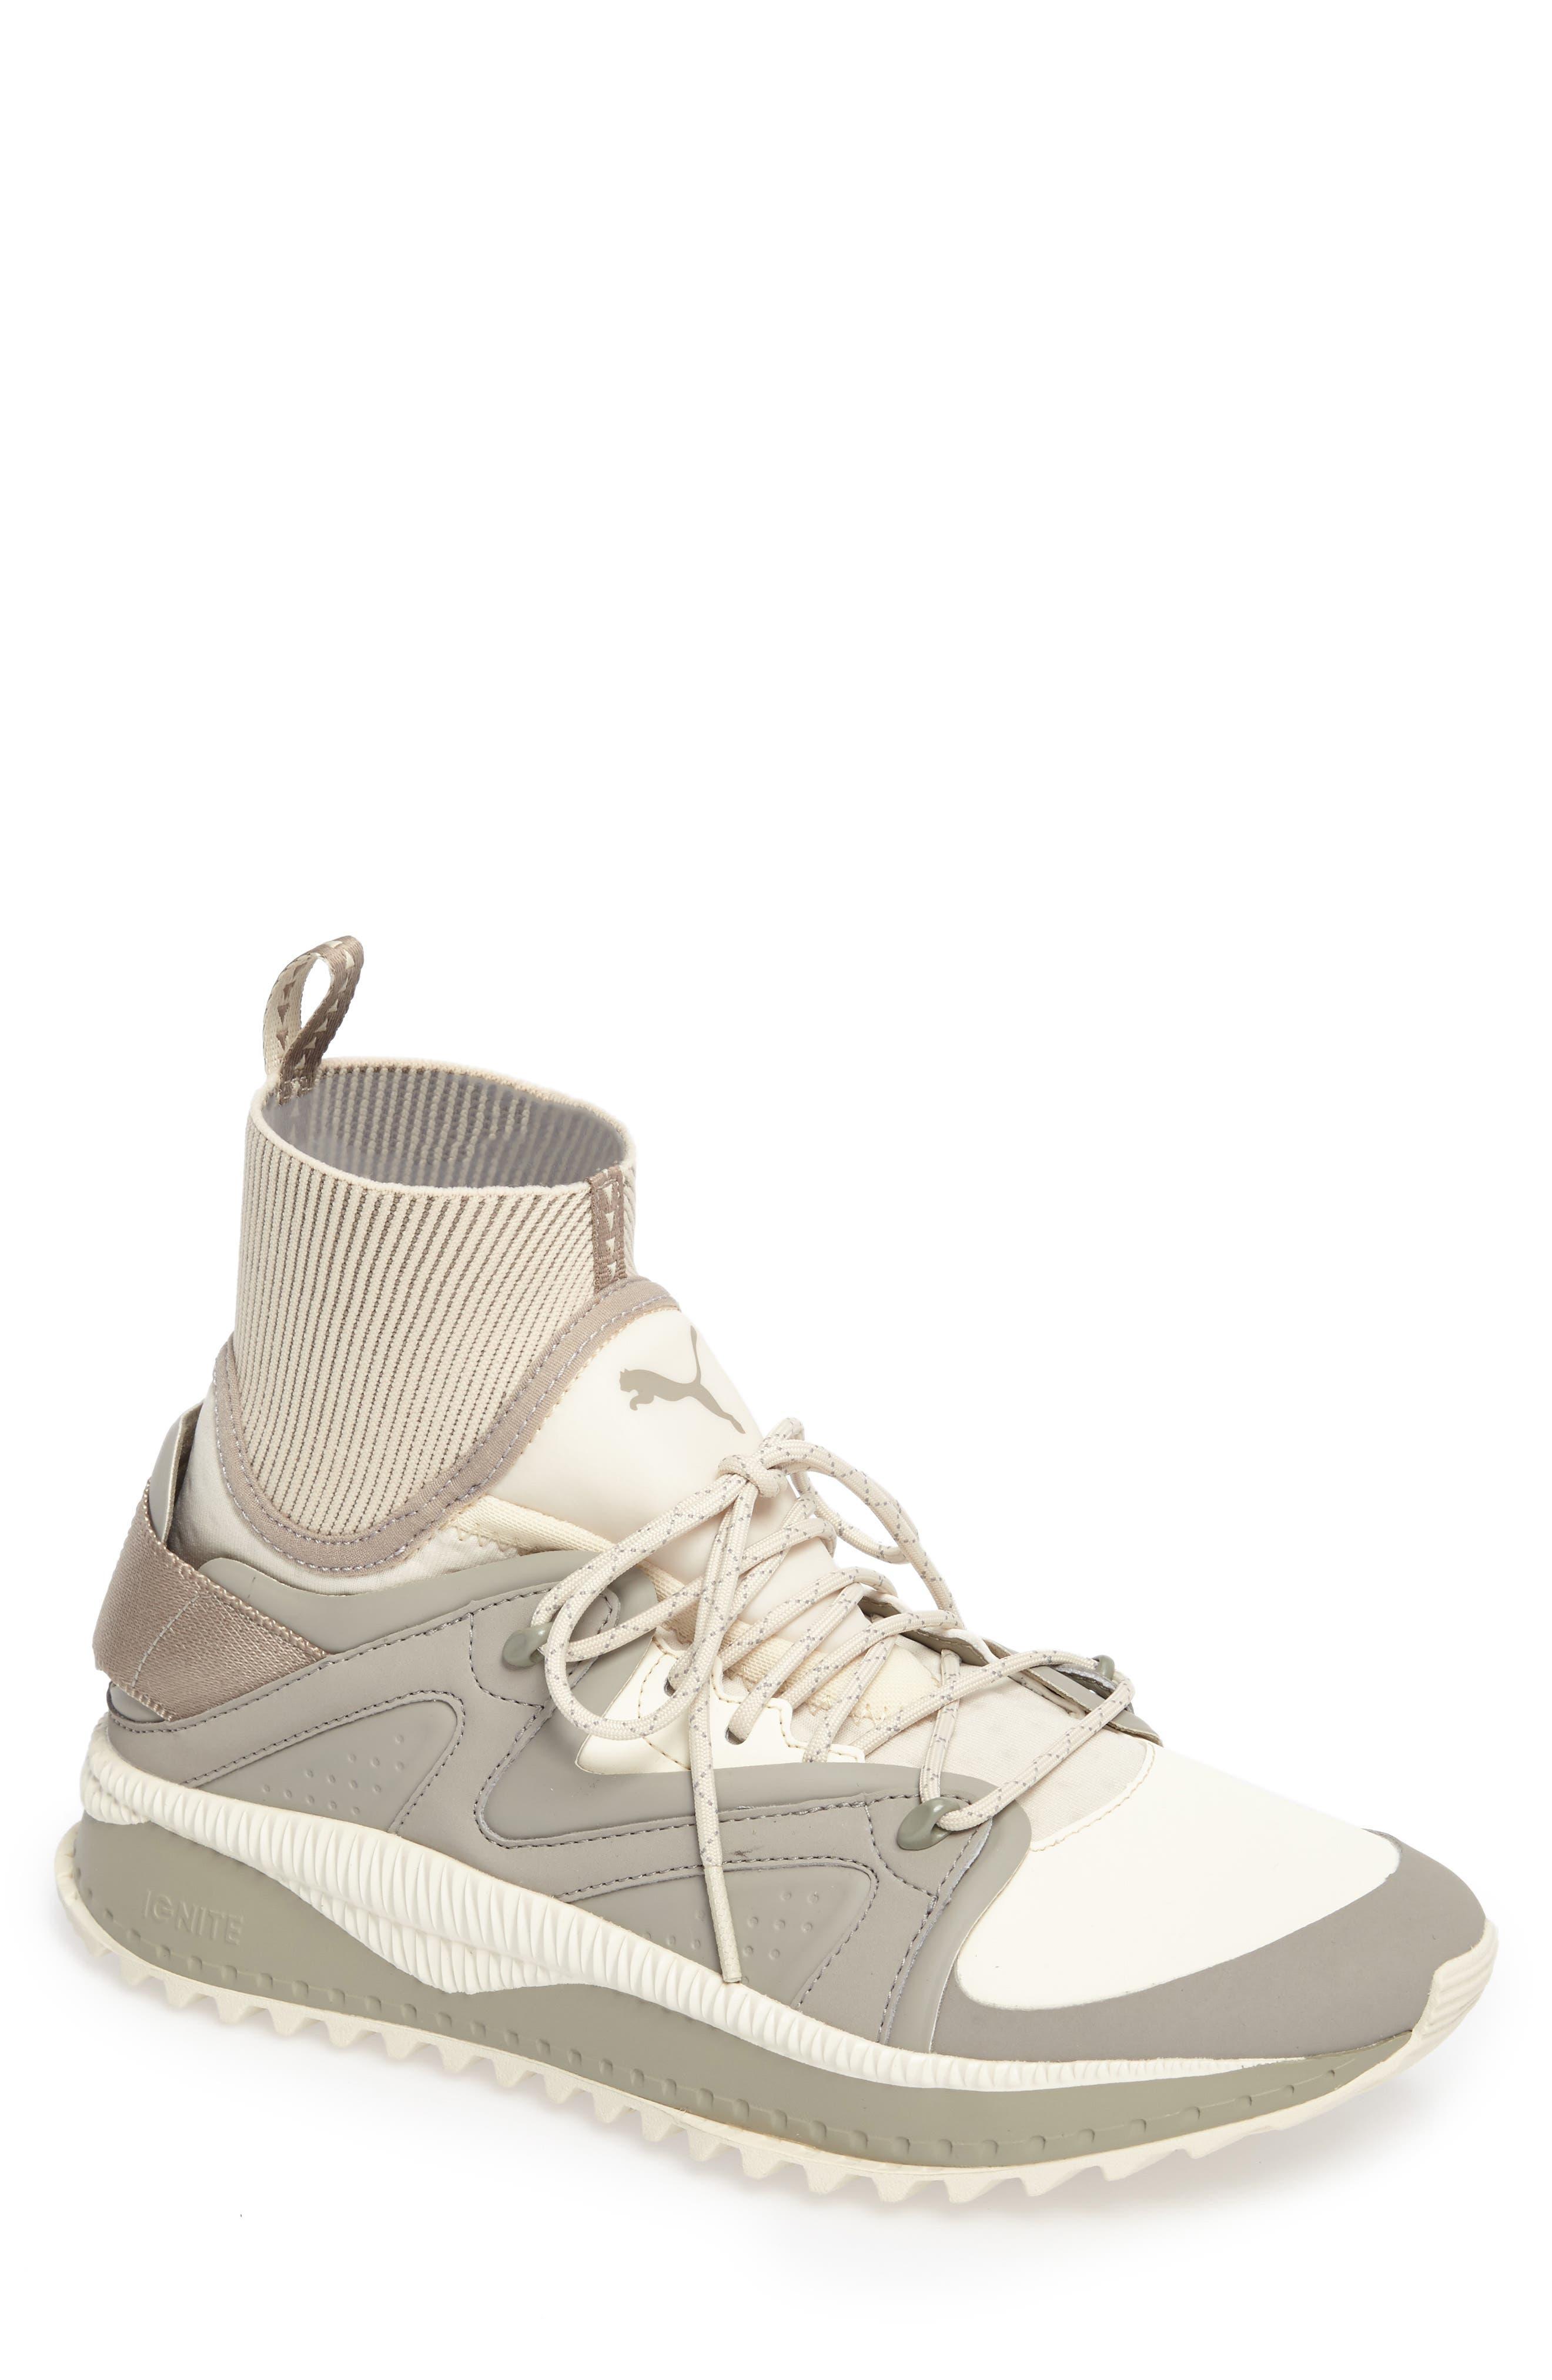 Tsugi Kori Sneaker,                         Main,                         color, Rock Ridge/ Birch